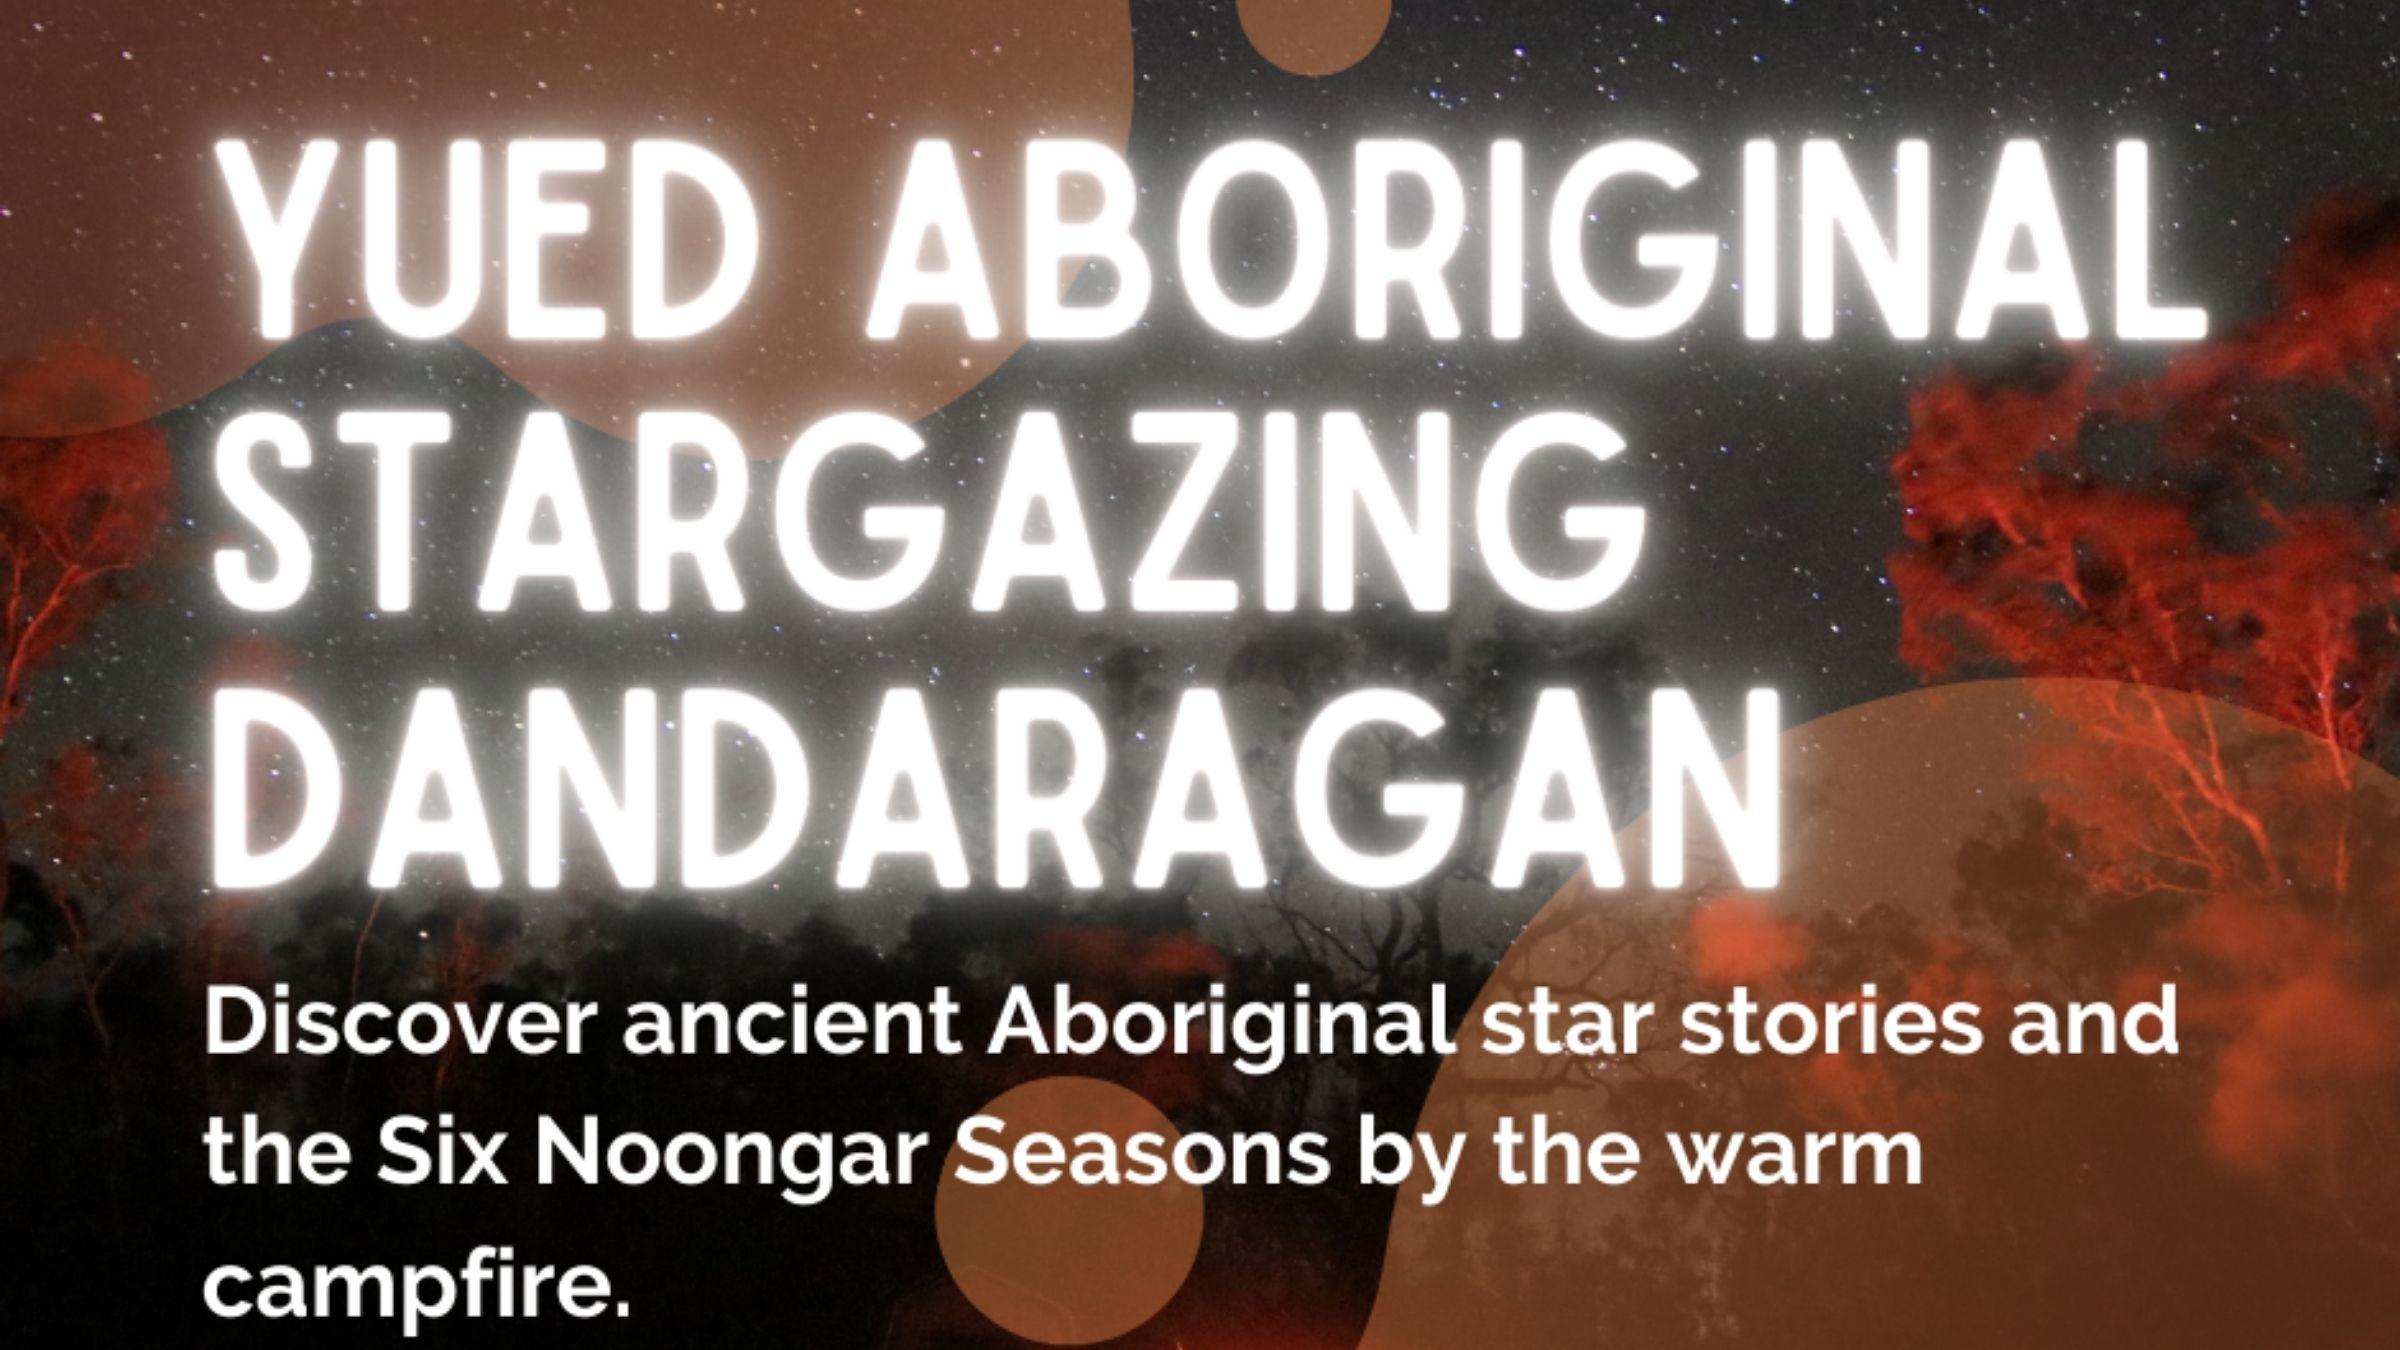 Dandaragan Yued Aboriginal Stargazing Night   9th July